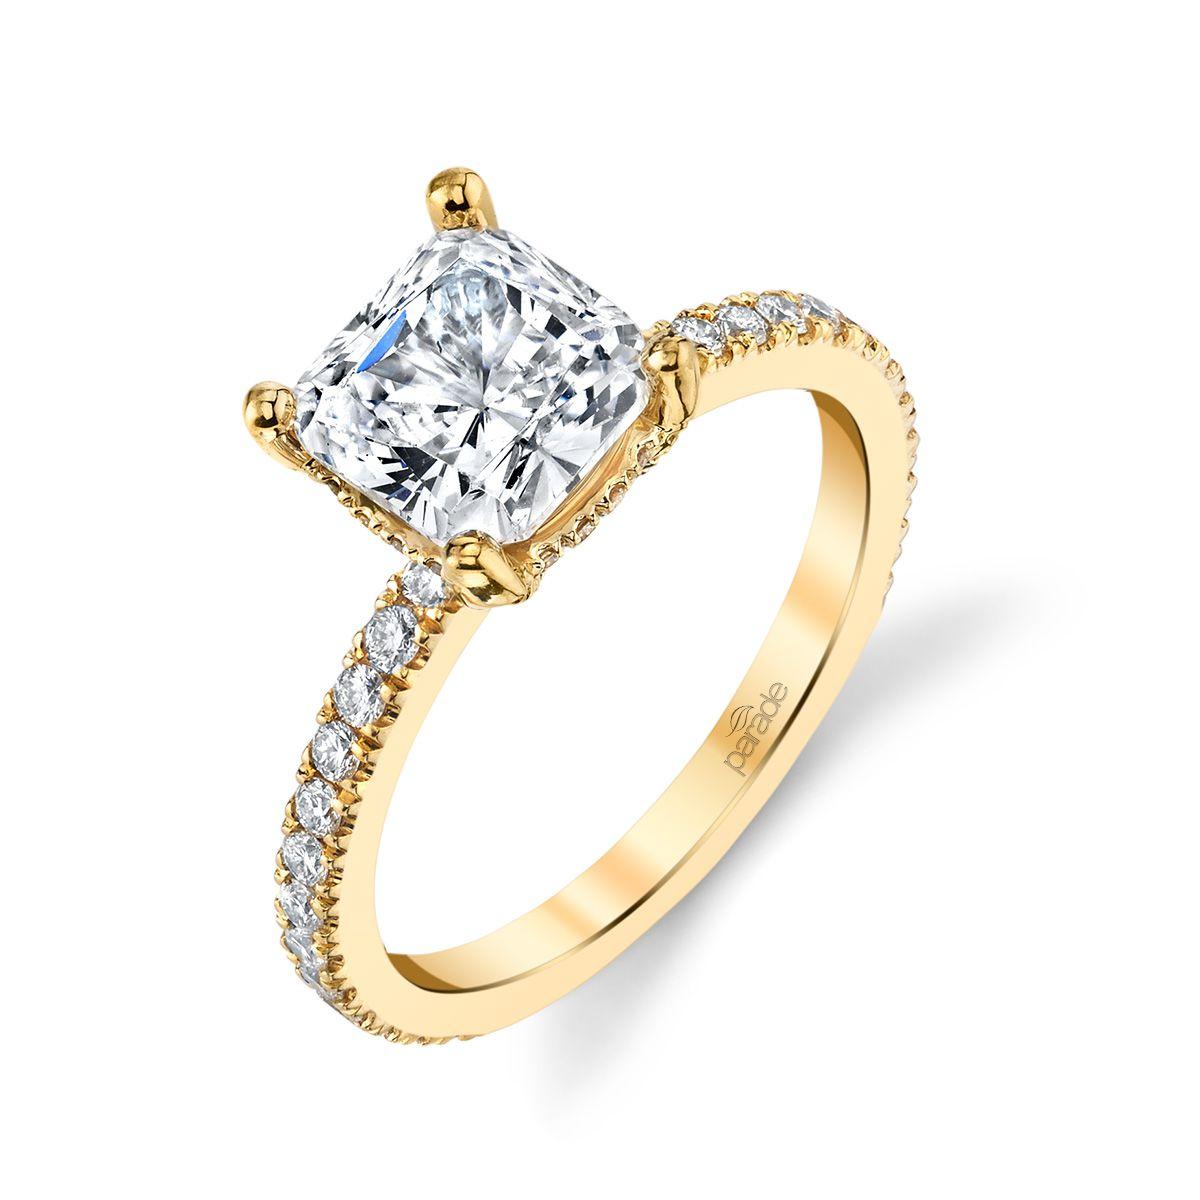 Parade Cushion-Cut Diamond Engagement Ring